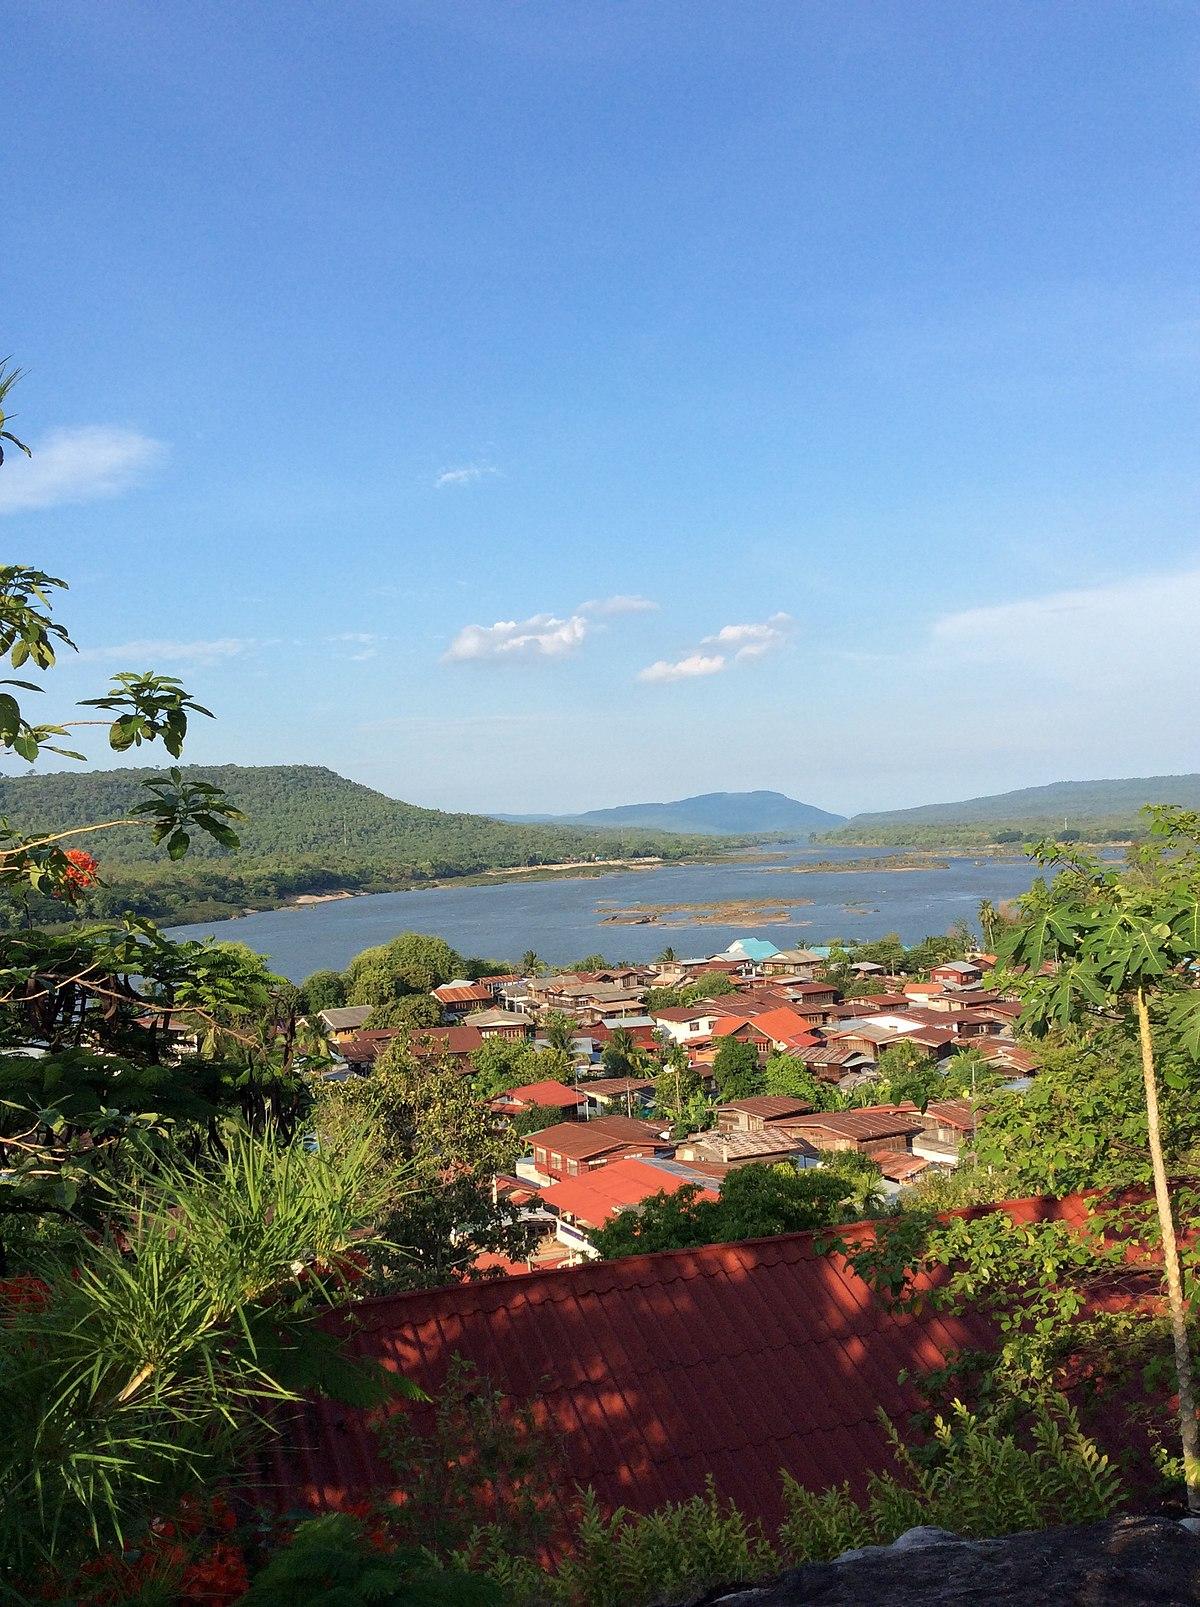 Ubon Ratchathani Province